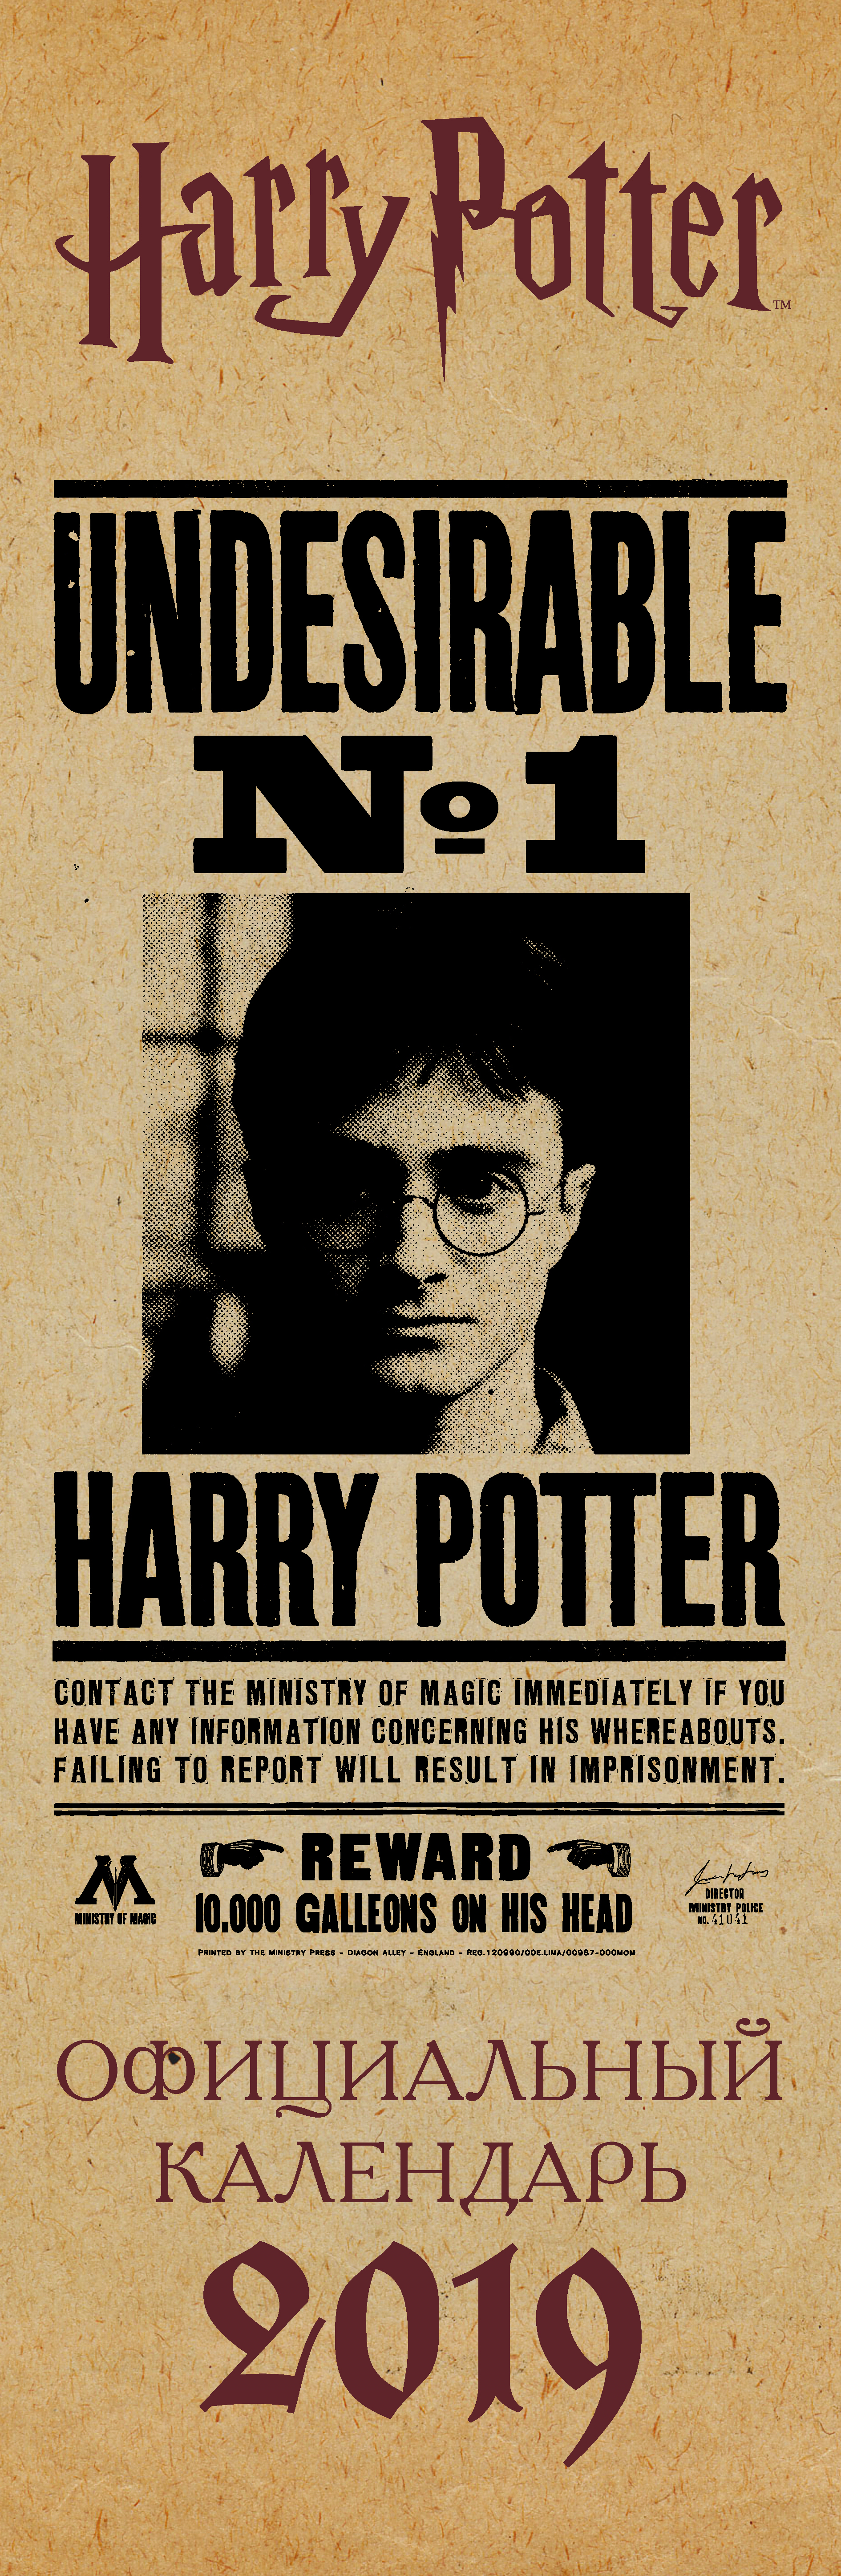 Гарри Поттер. Календарь настенный на 2019 год (160х490 мм) ISBN: 978-5-04-095265-6